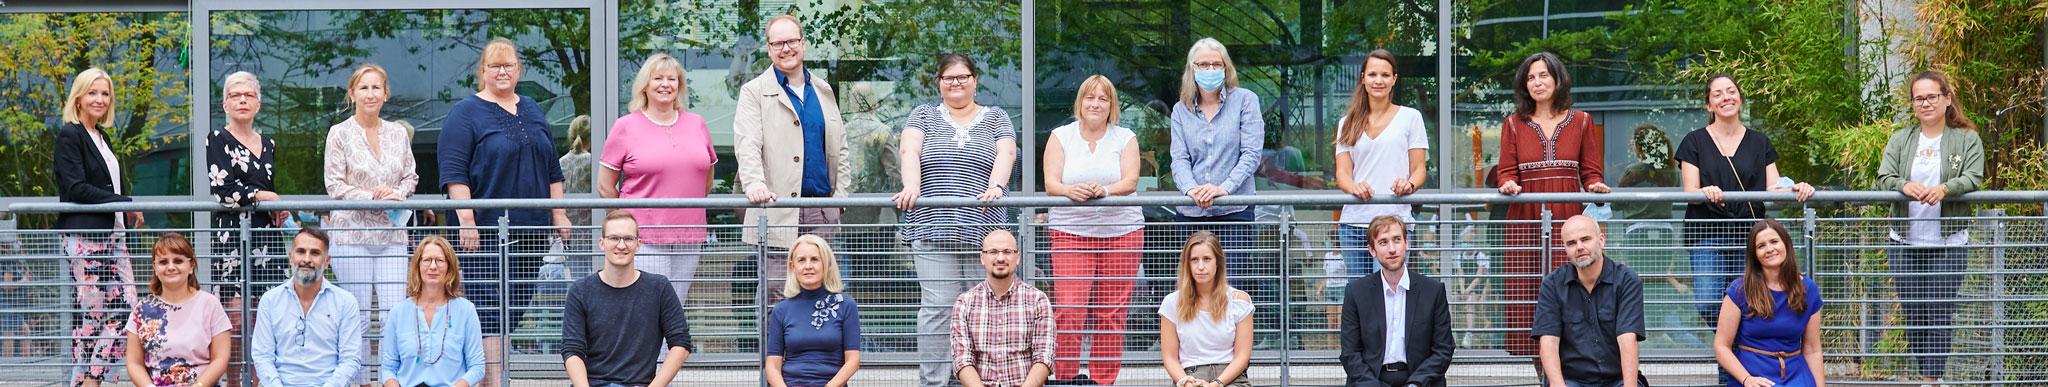 Erasmus-Frankfurter-Stadtschule-2020-aug-25-lehrer-kollegium-SWF-6859